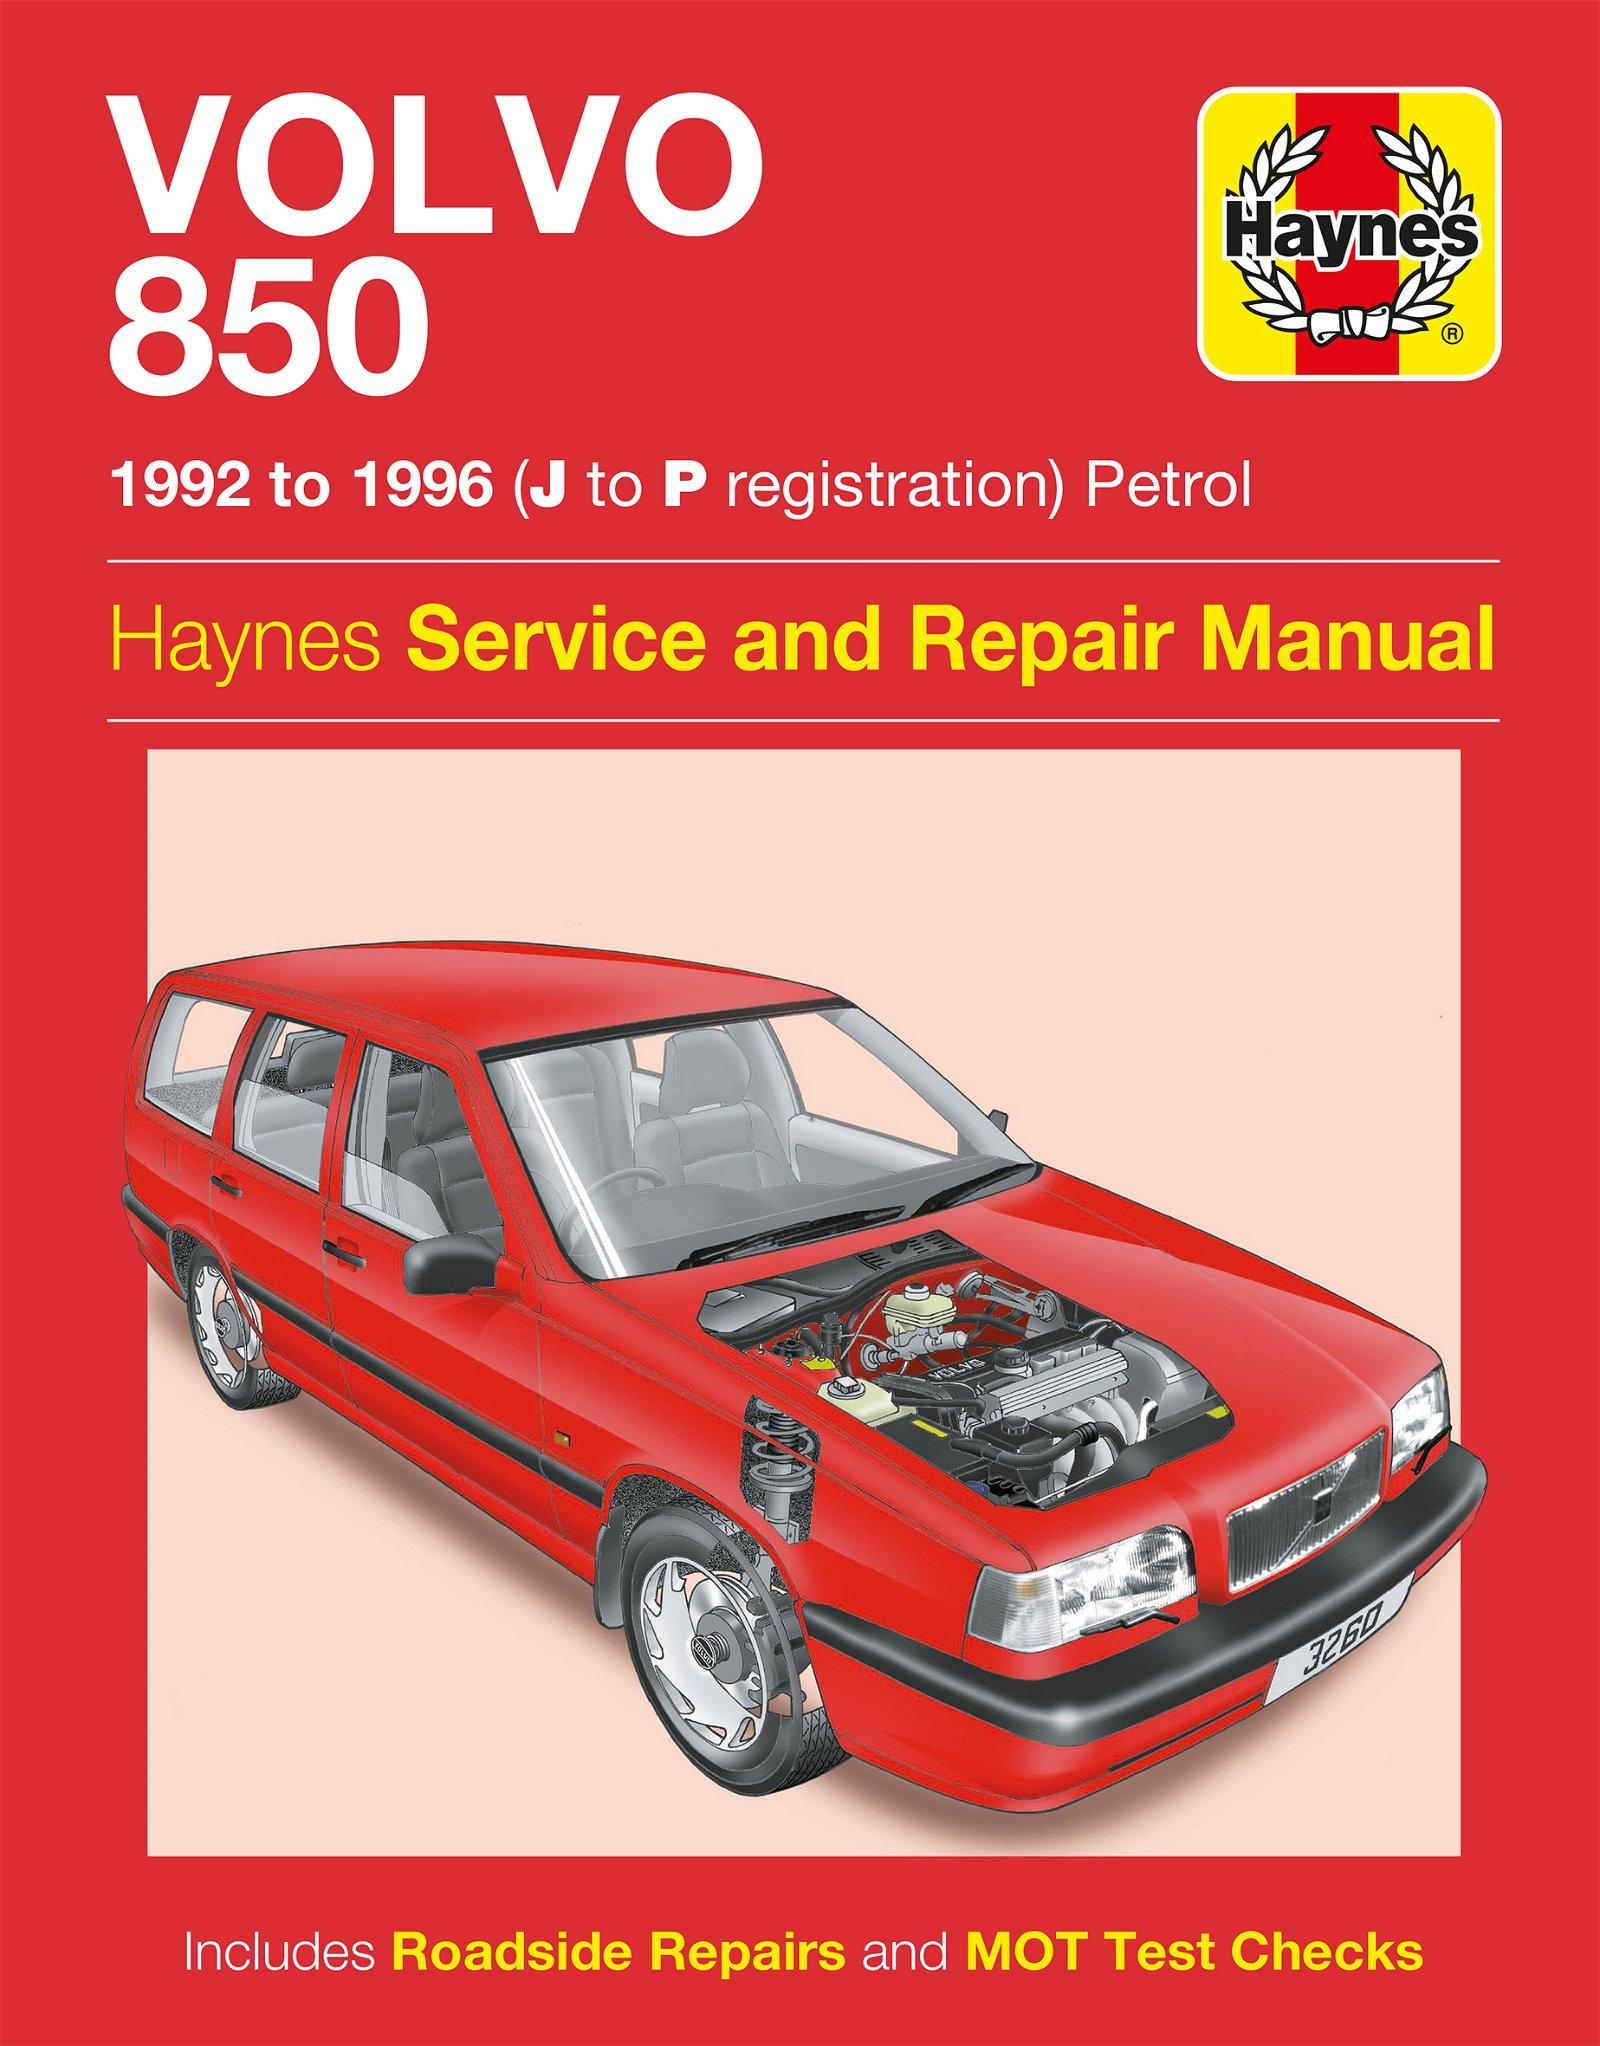 [Manuel UK en Anglais] Volvo 850 Petrol  (92 - 96)   J to P